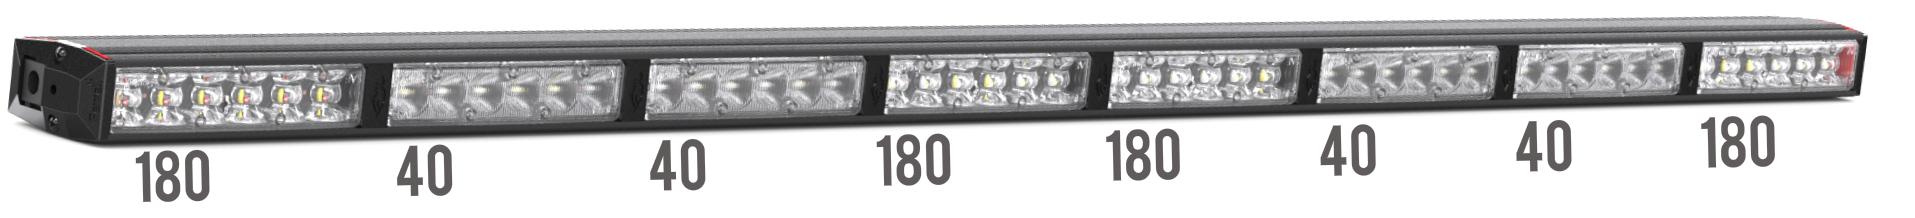 feniex-fusion-800-lightstick-various-optics.jpg